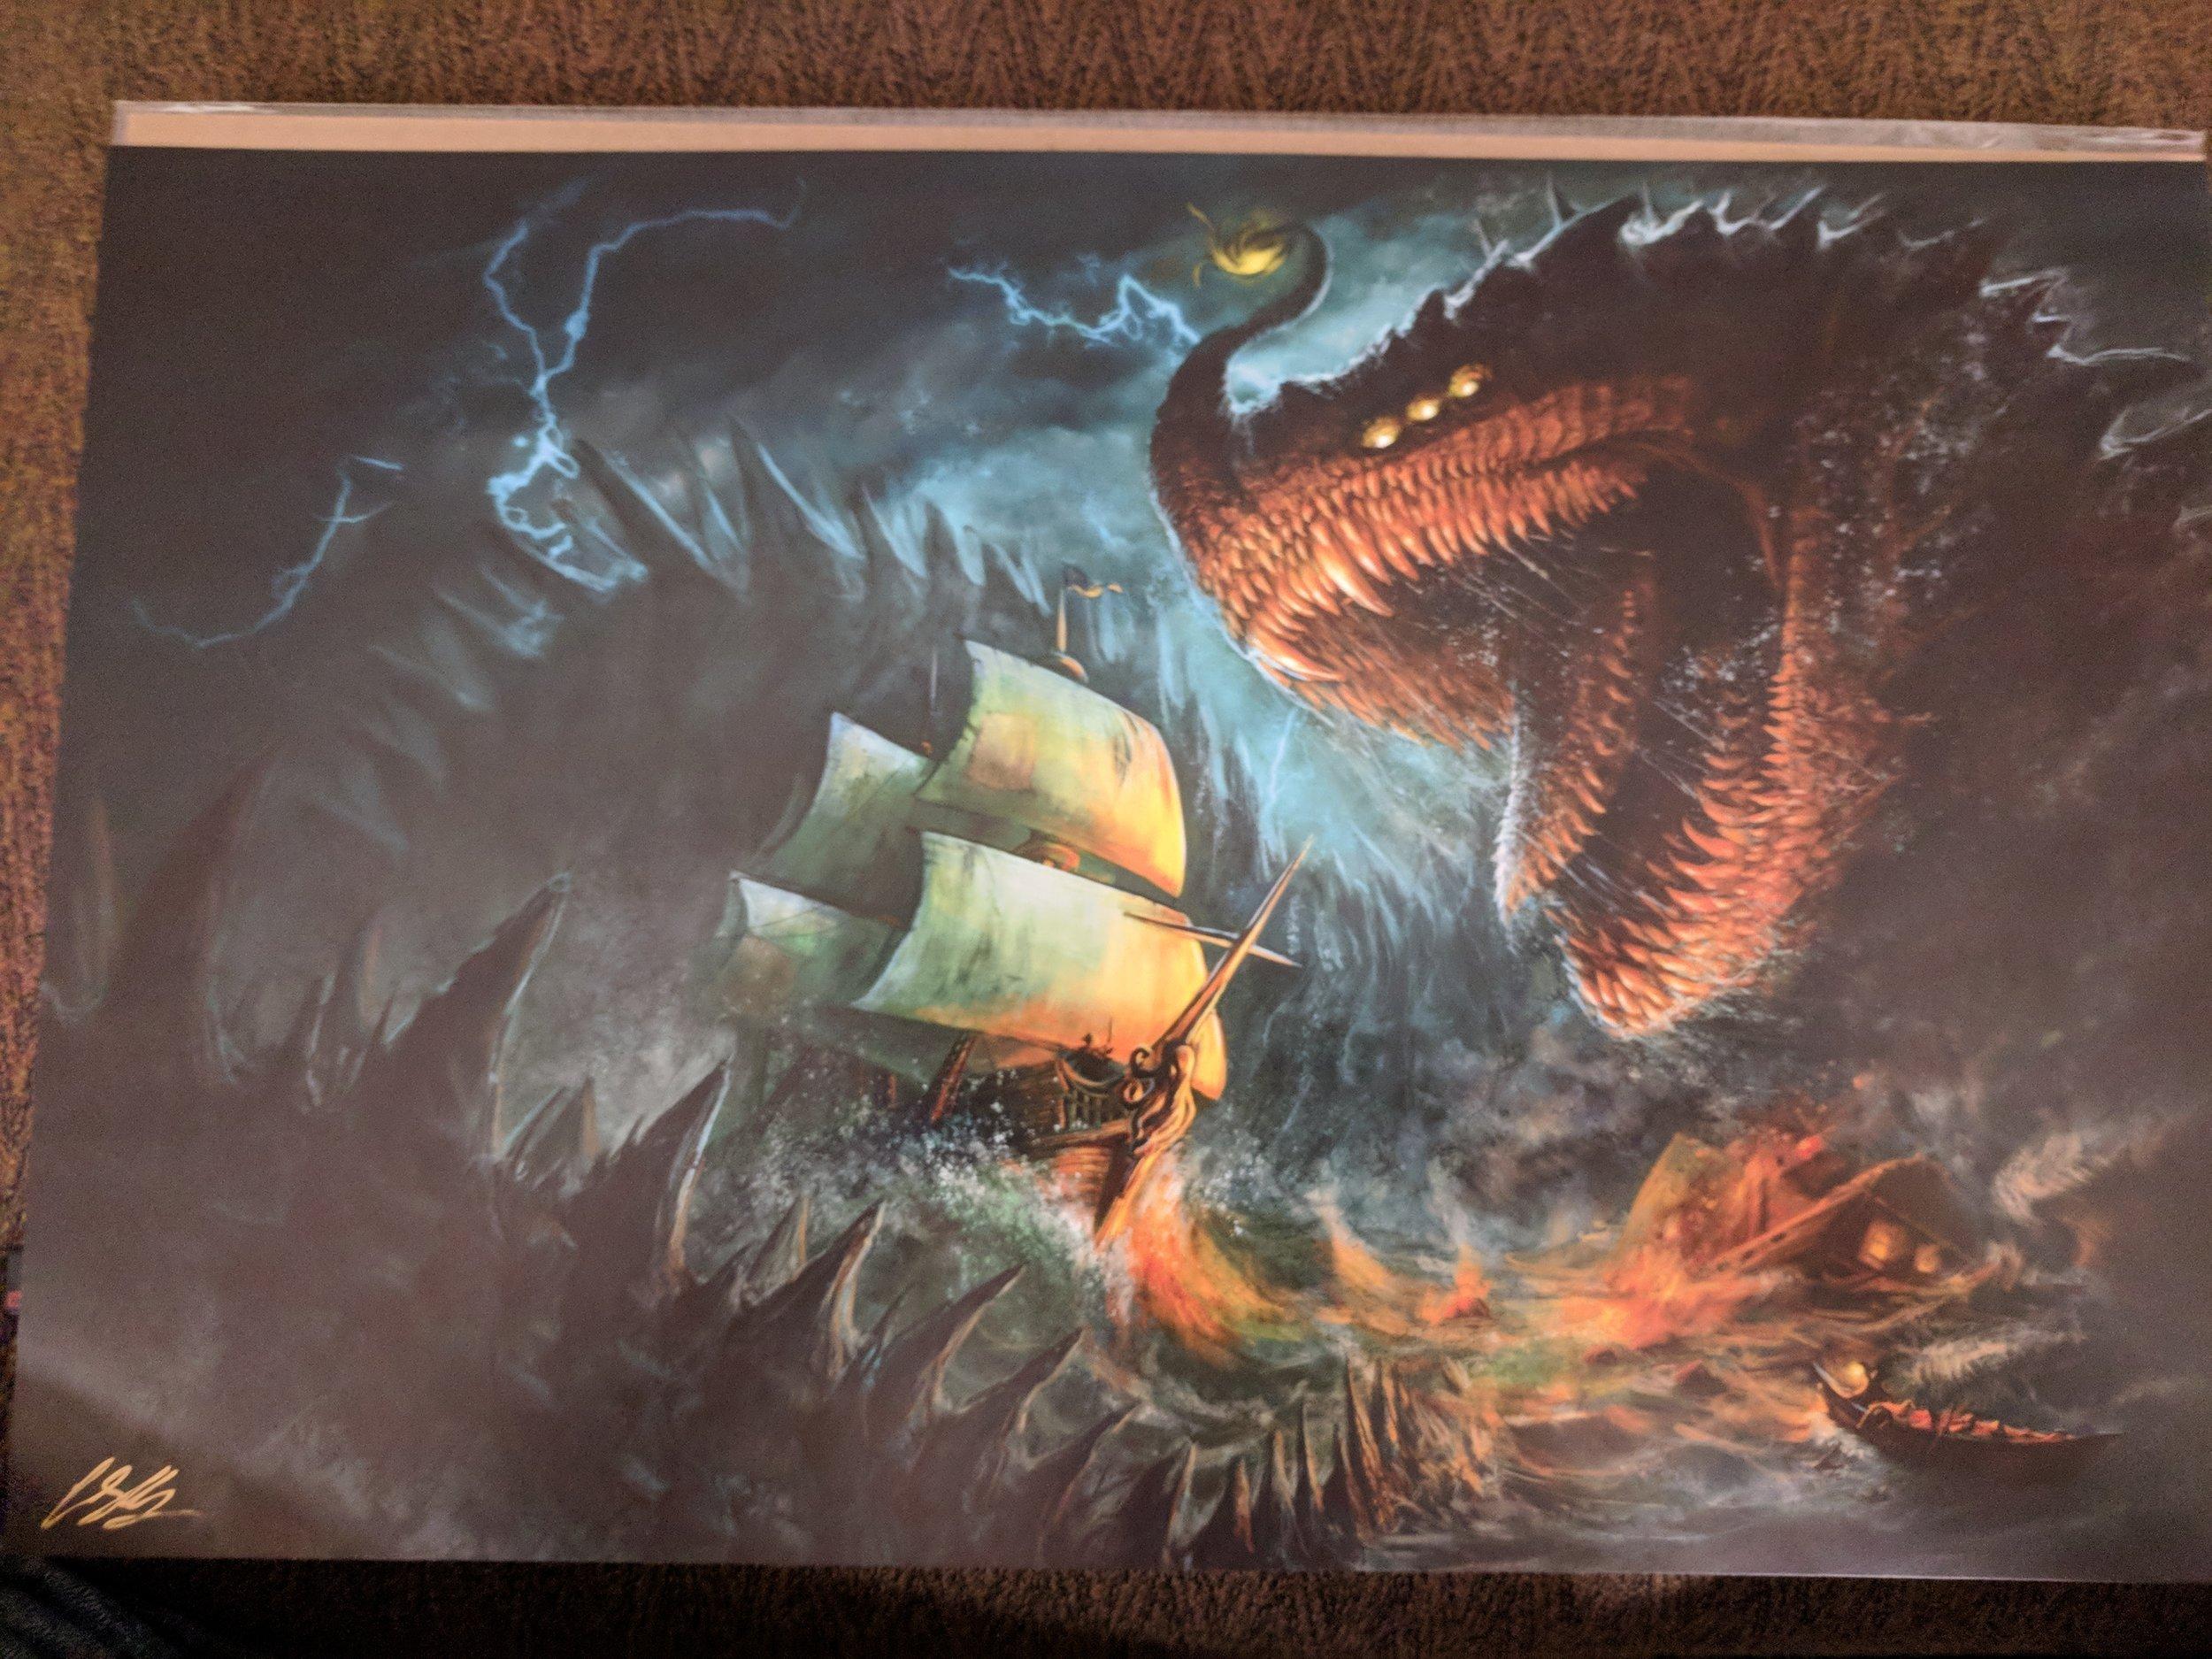 """The Kraken Hunter"" by Crystal Sully"